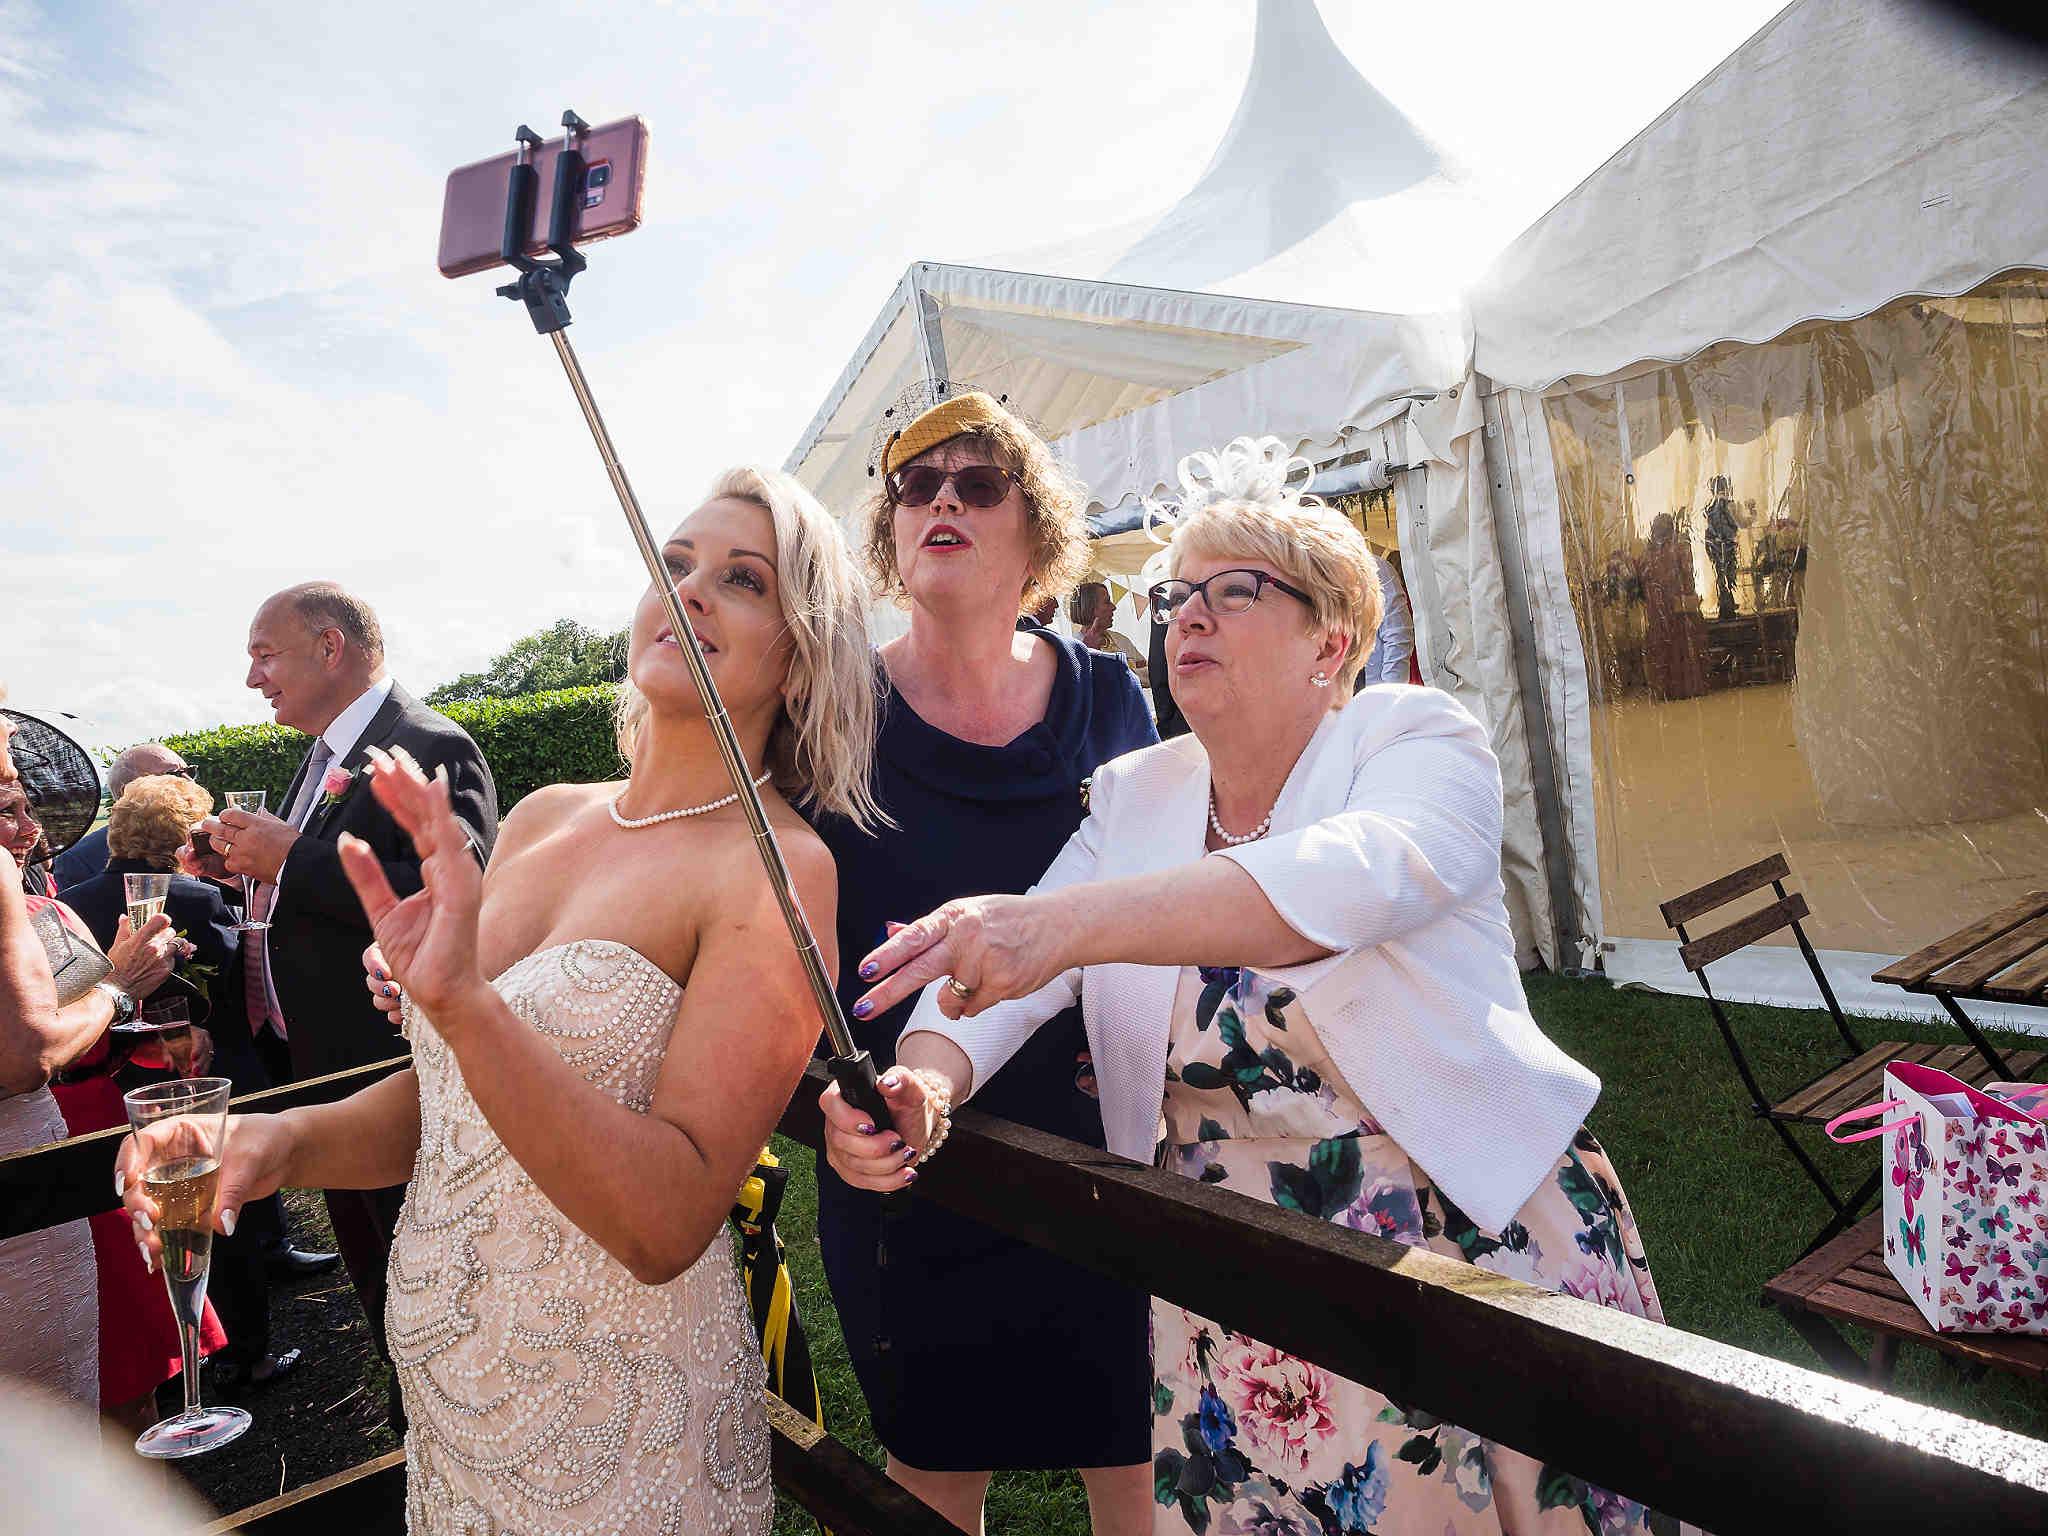 wedding photo selfie